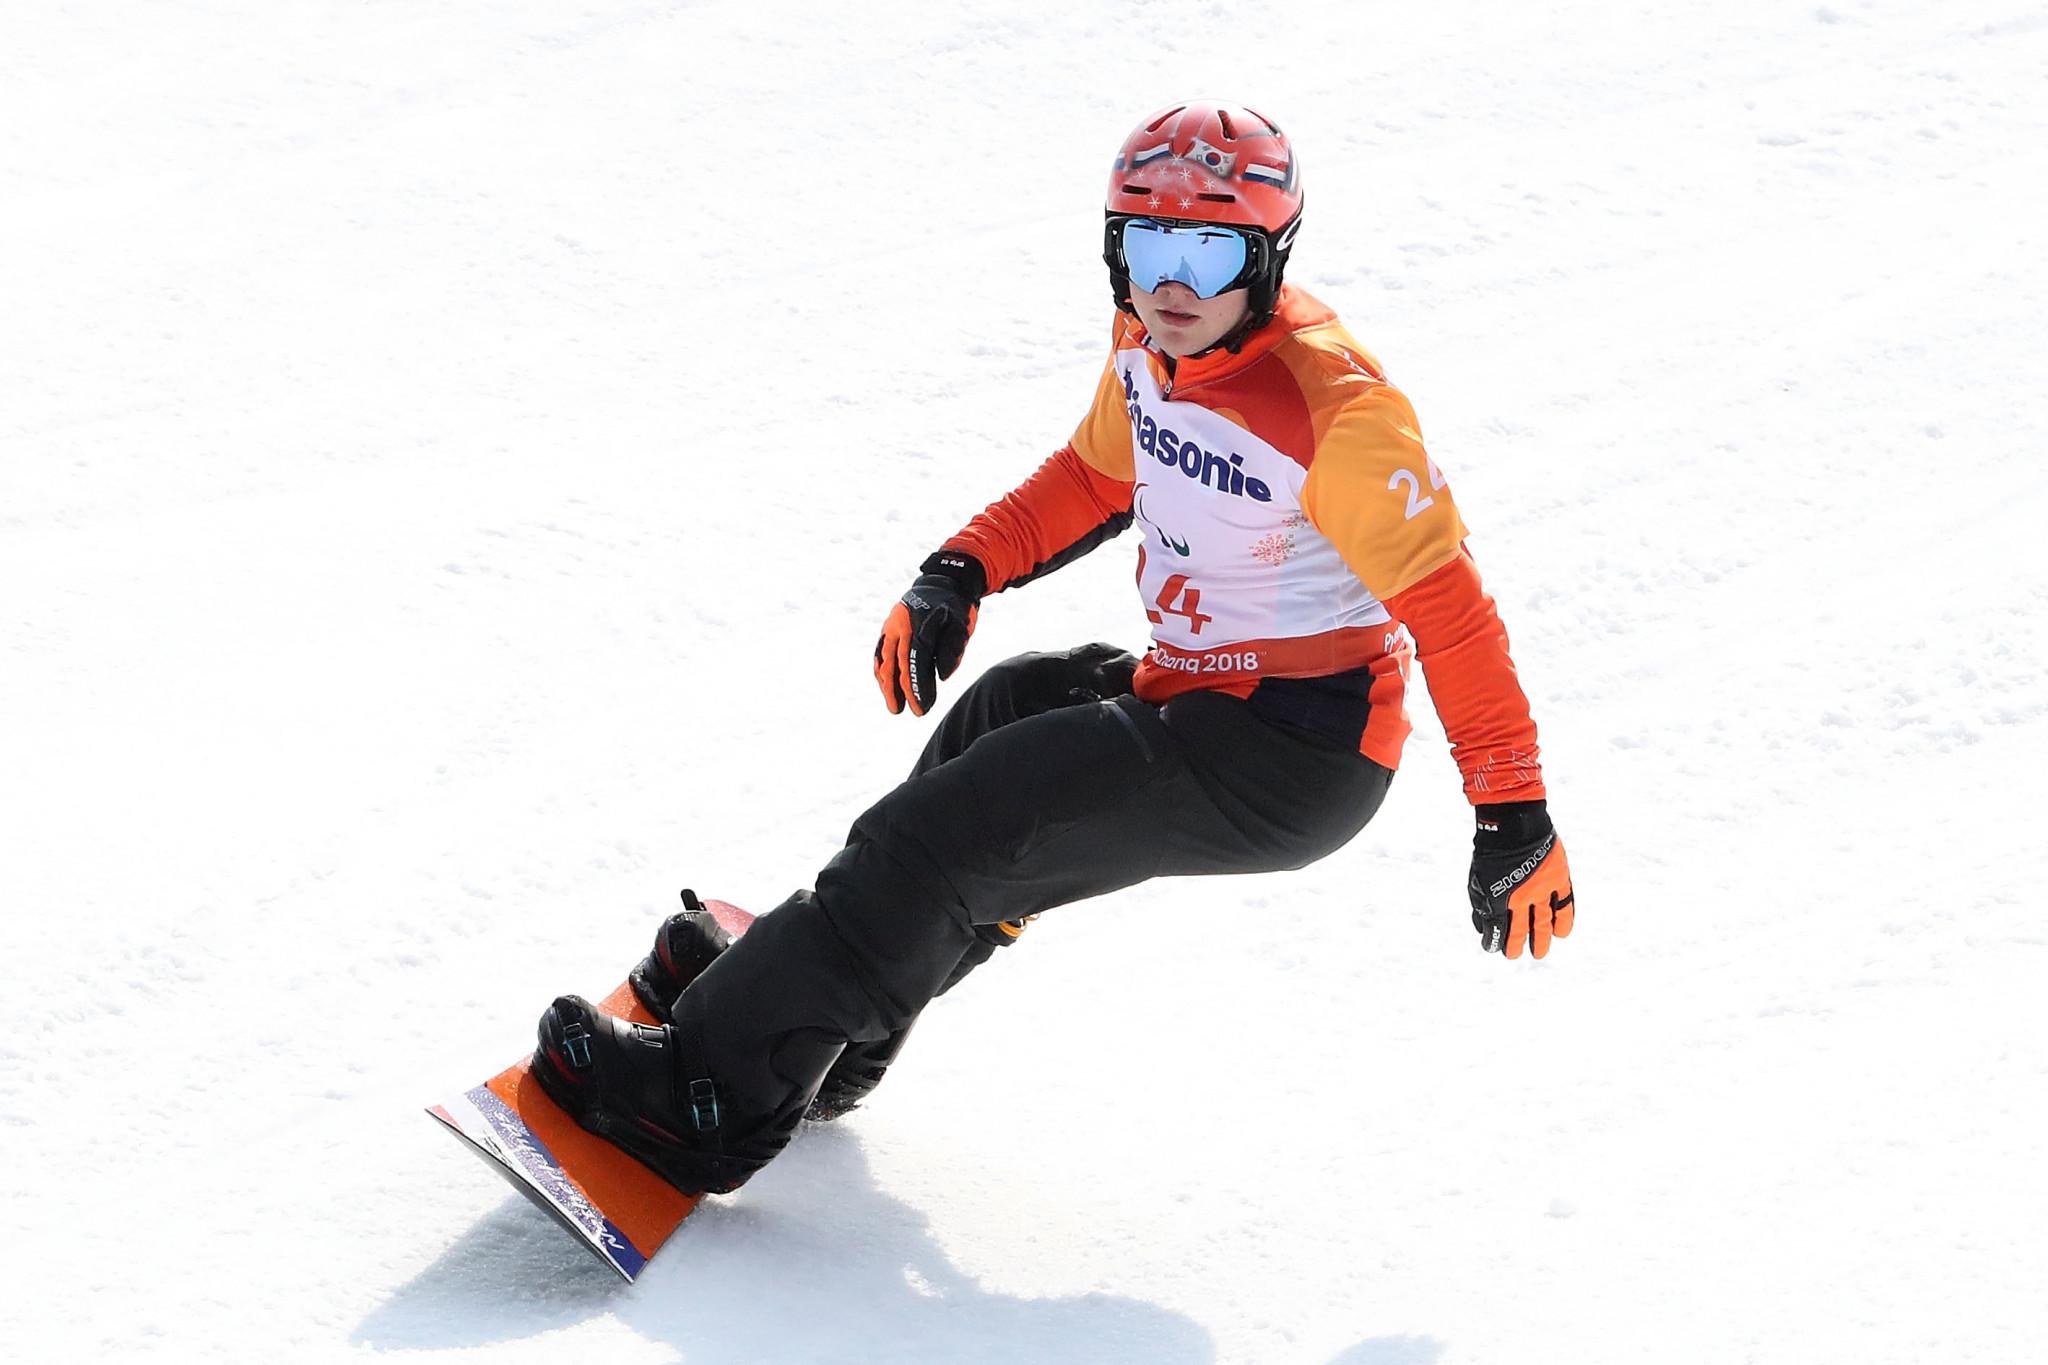 Dutchman Chris Vos beat favourite Reinhold Schett of Austria to clinch gold in the men's snowboard cross SB-LL1 event ©Getty Images